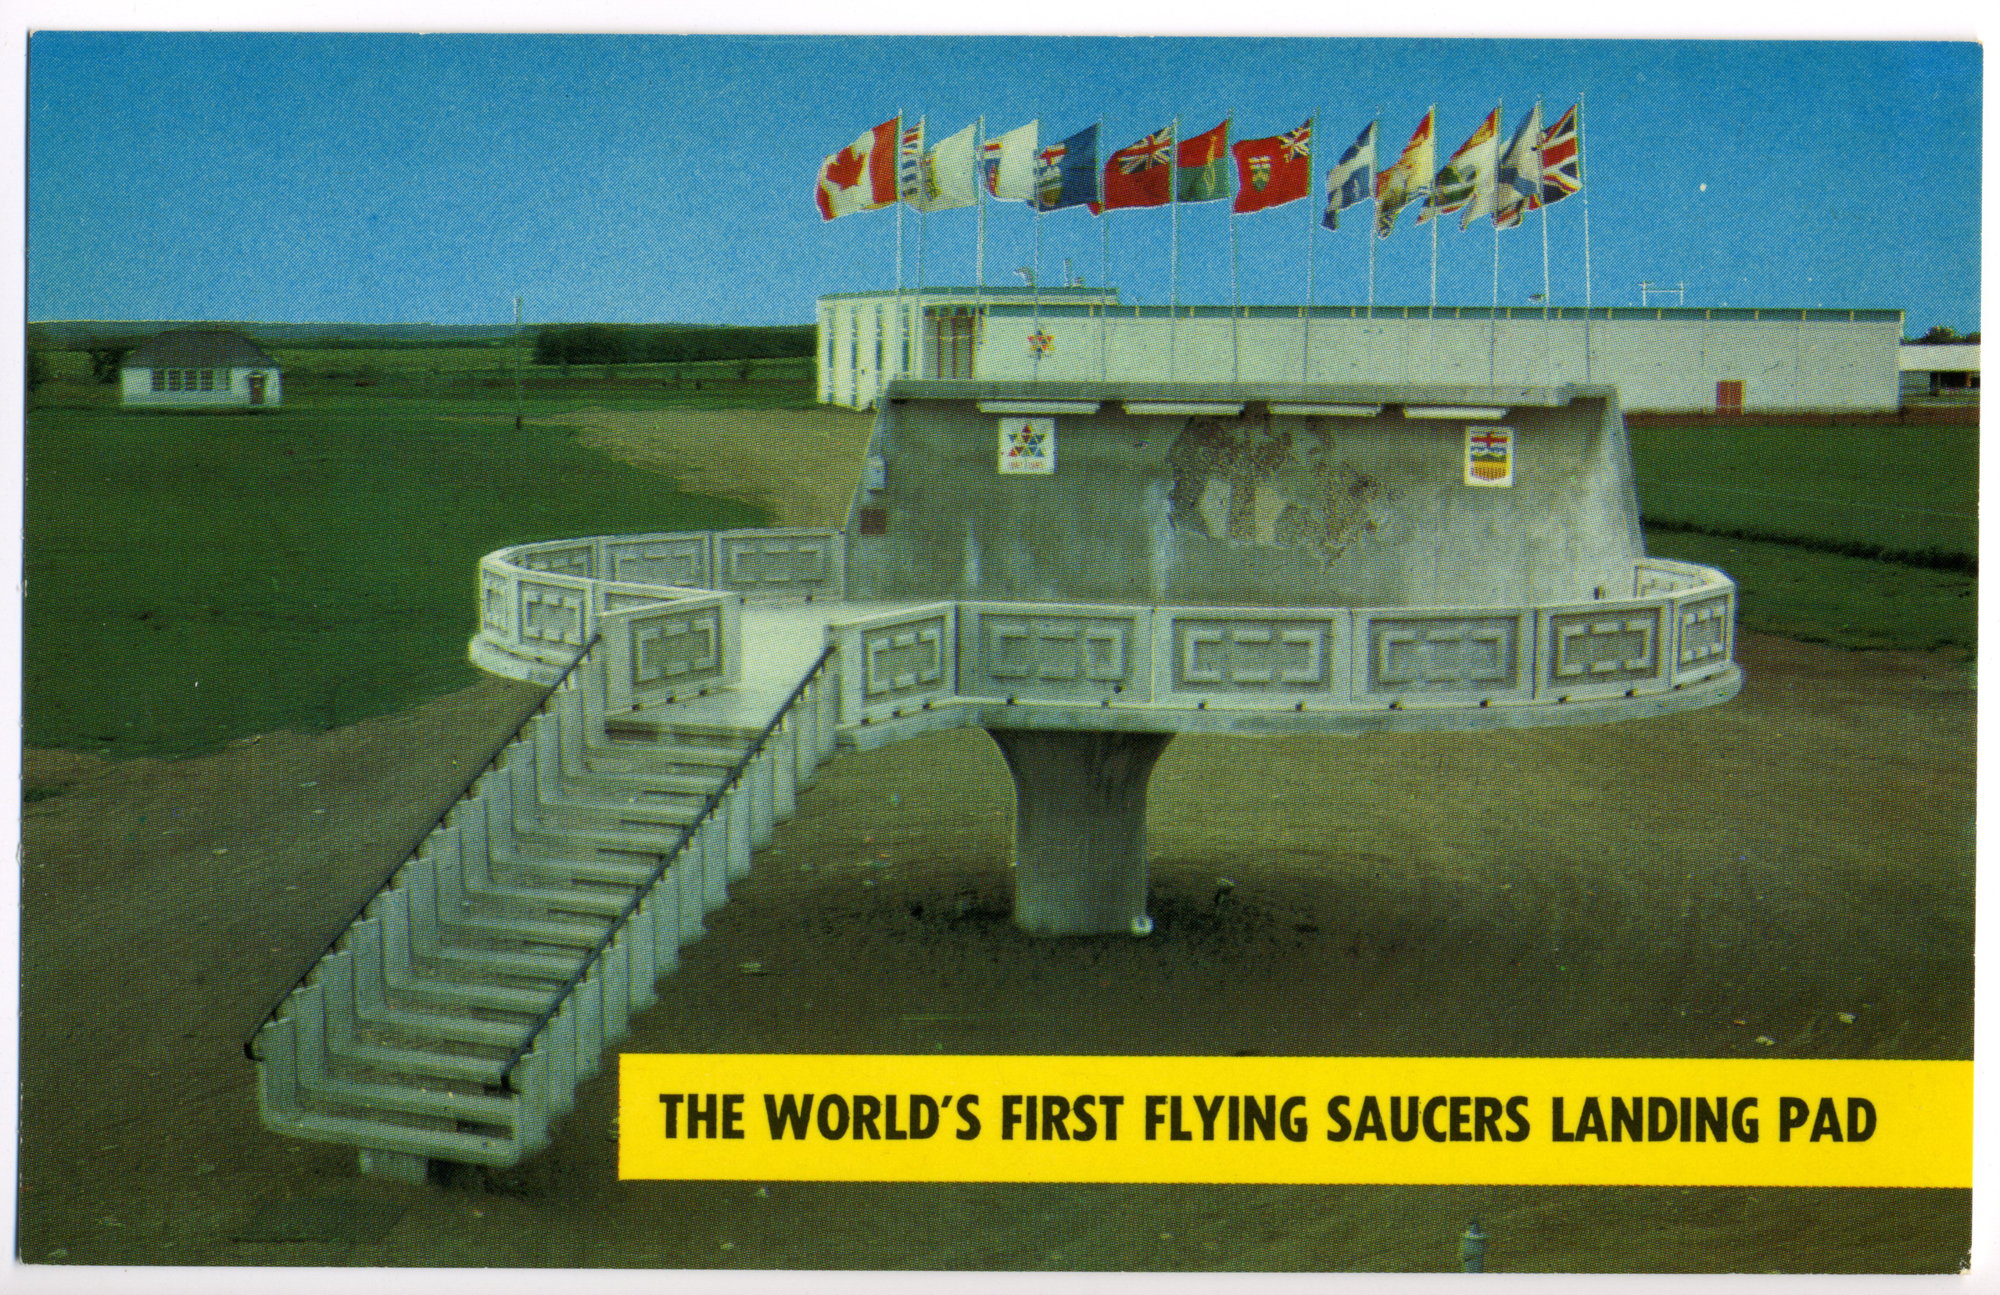 World's First Flying Saucer Landing Pad - (Alberta, Canada Postcard circa 1967)